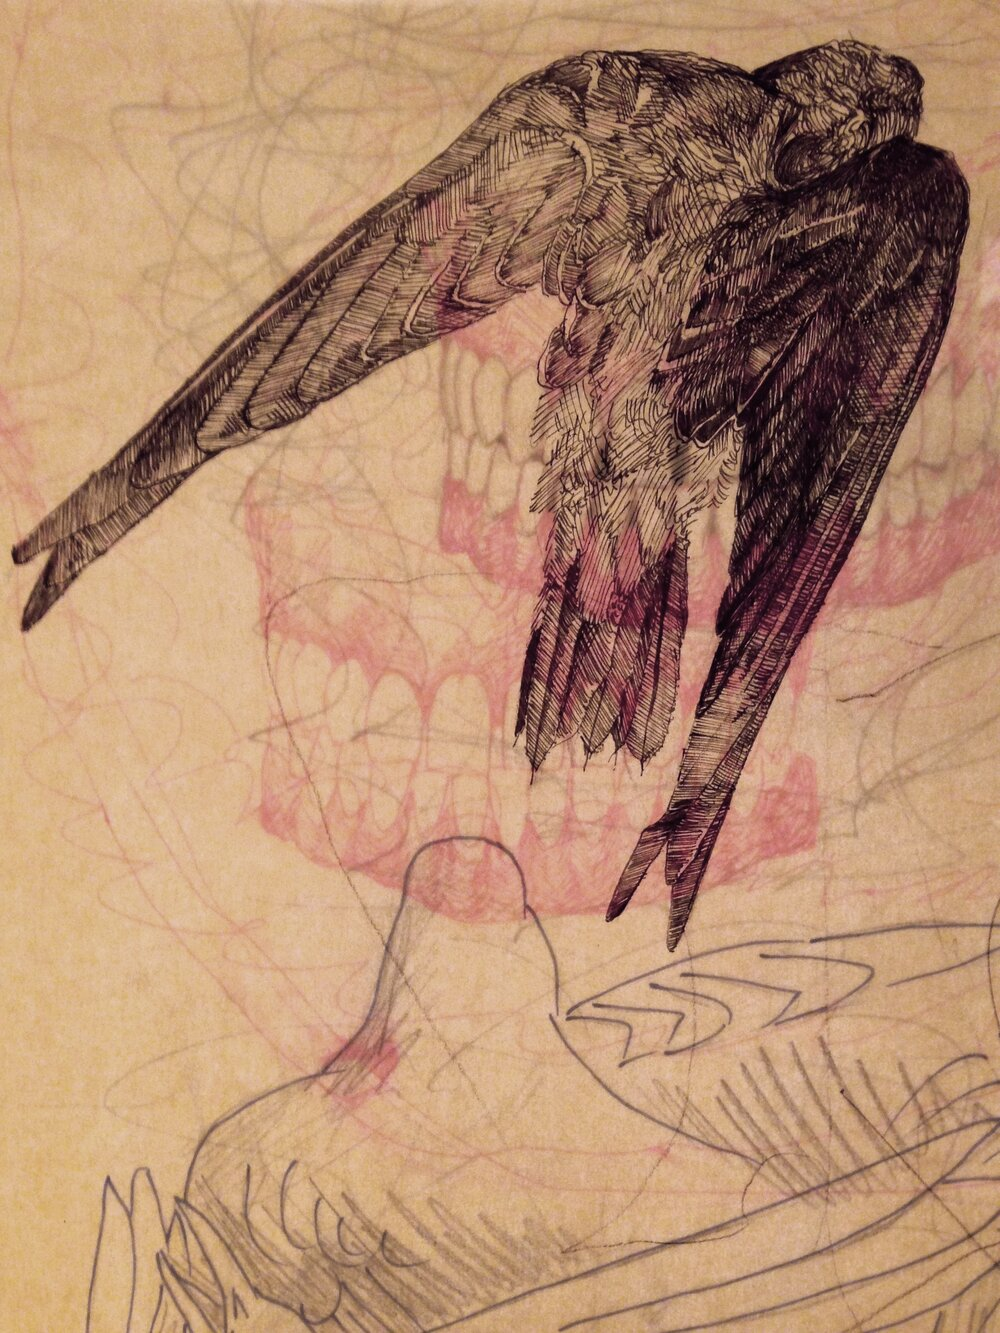 Torso, Katherine Rutecki, 2015 (Detail)